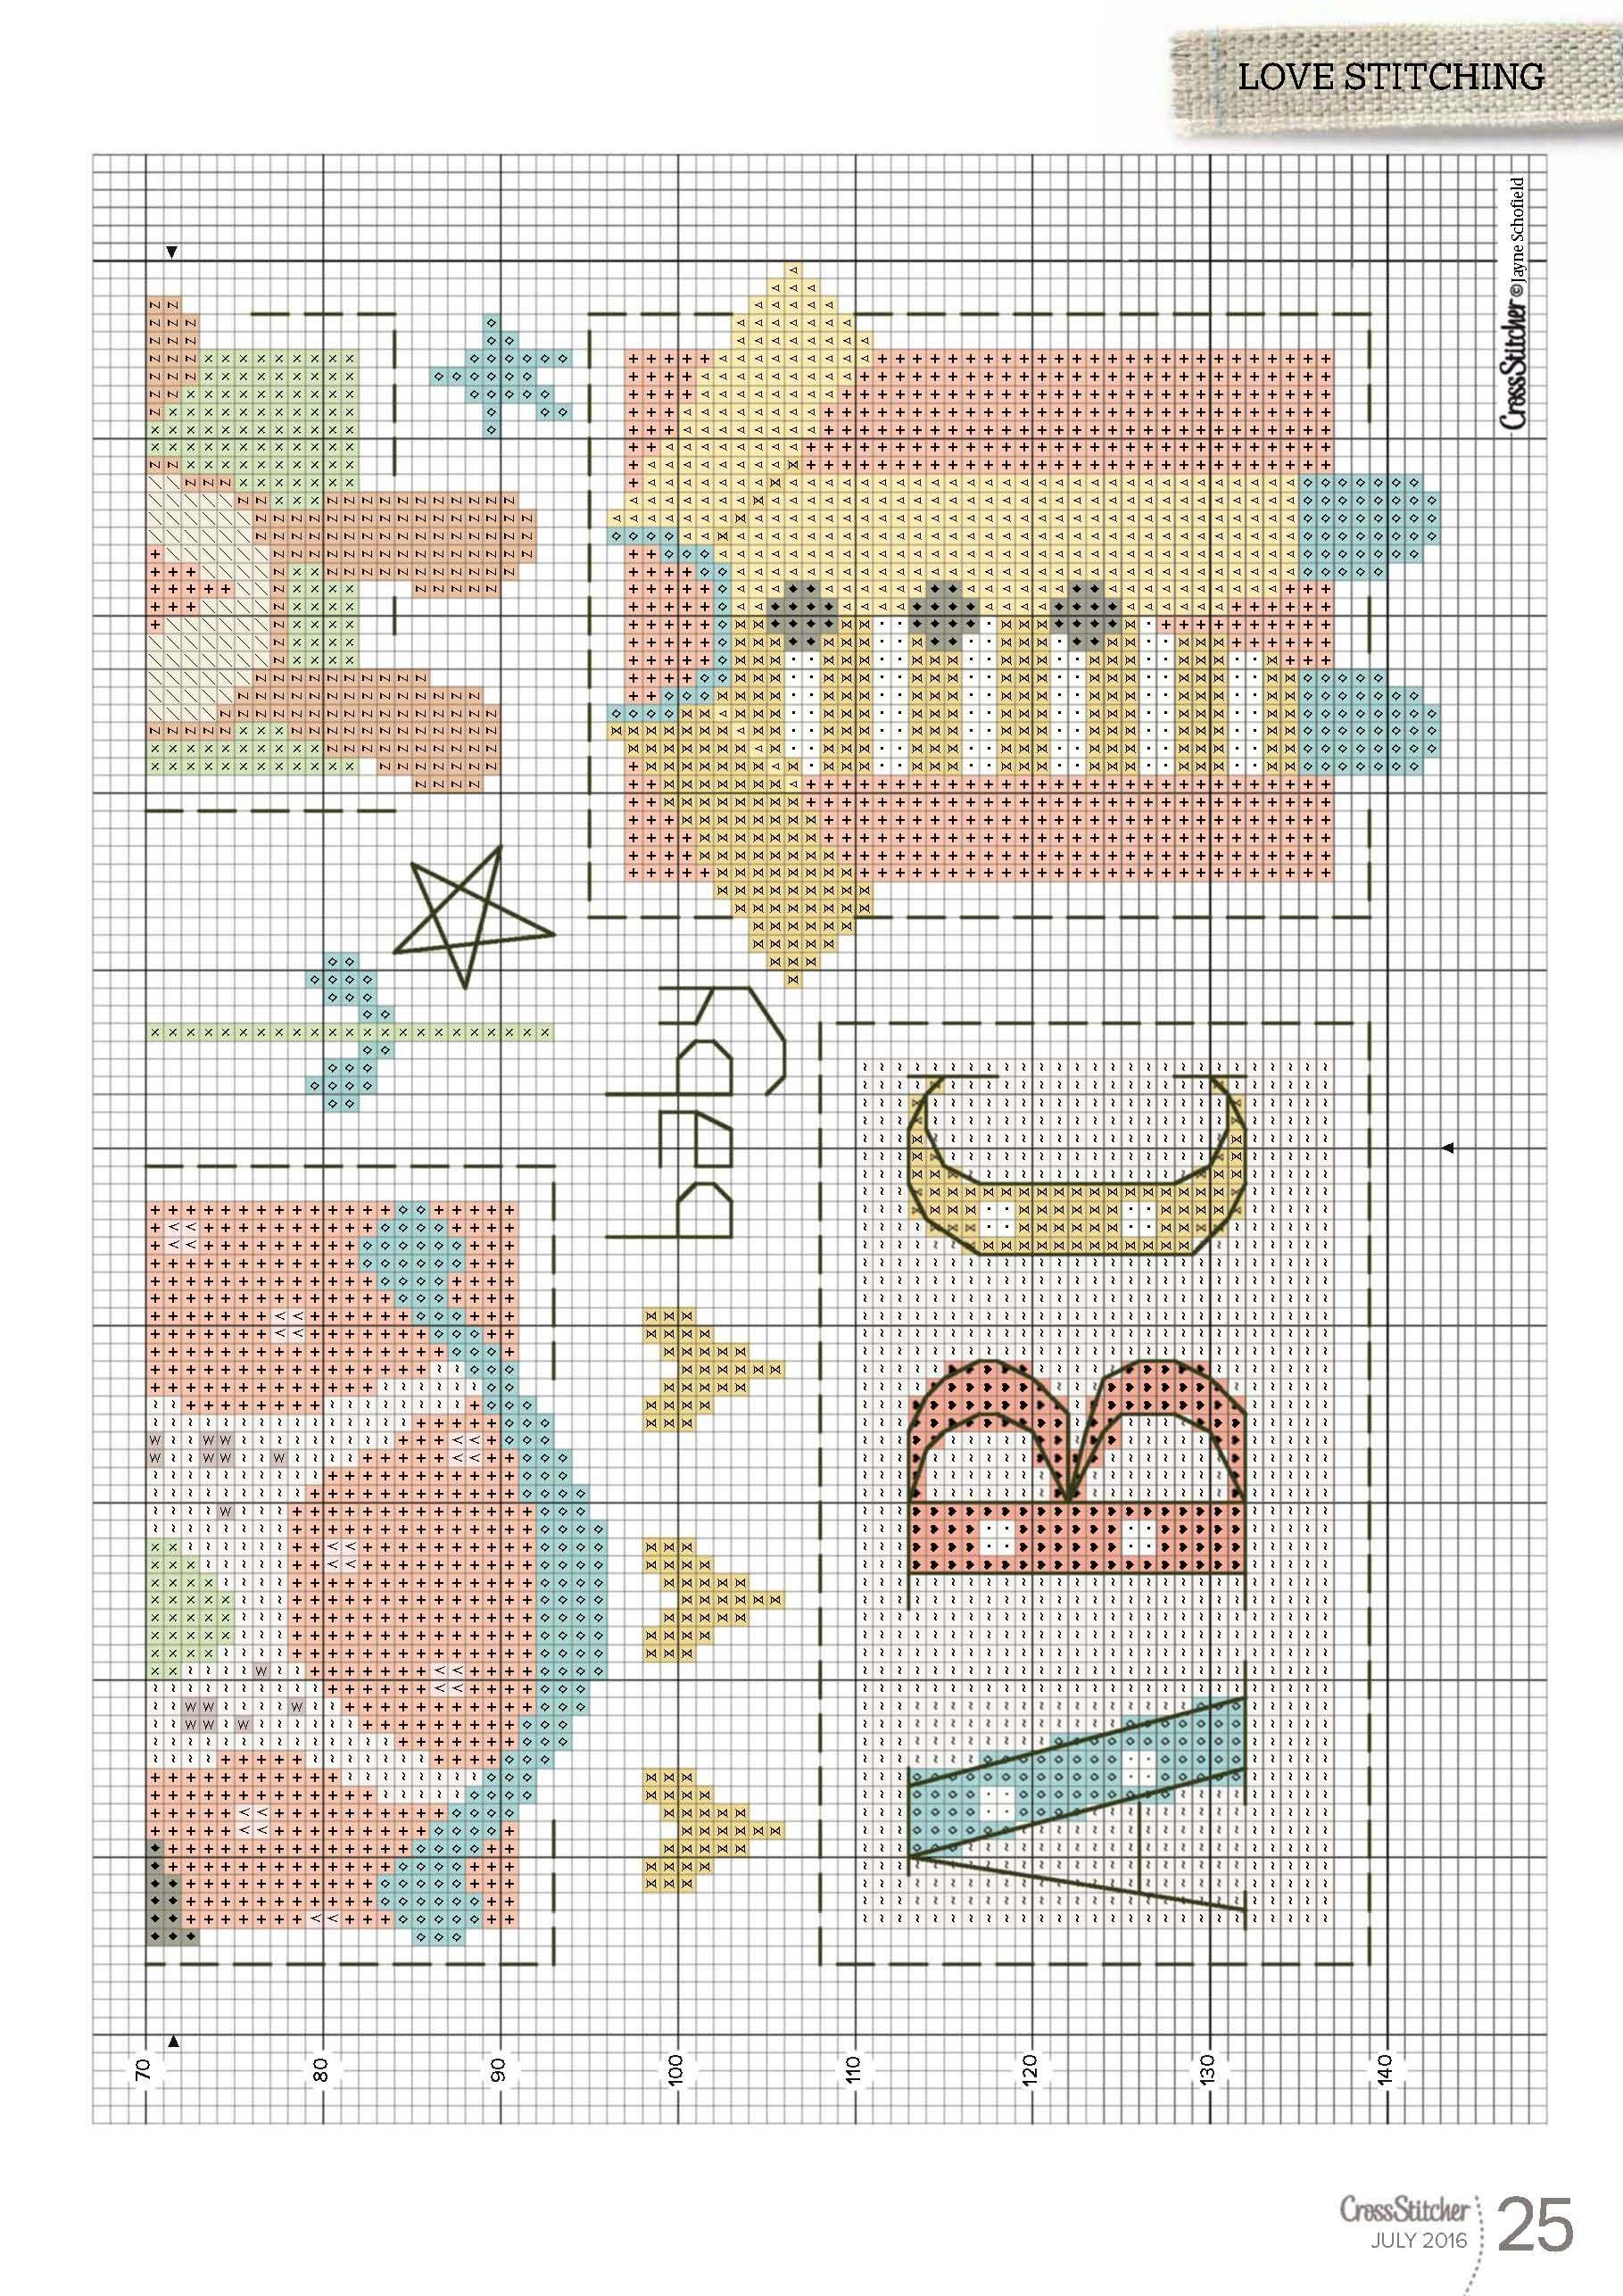 Good Night Sleep Tight From Cross Stitcher N 307 July 2016 4 Of 6 Cross Stitch Baby Cross Stitch Patterns Free Cross Stitch Patterns Christmas